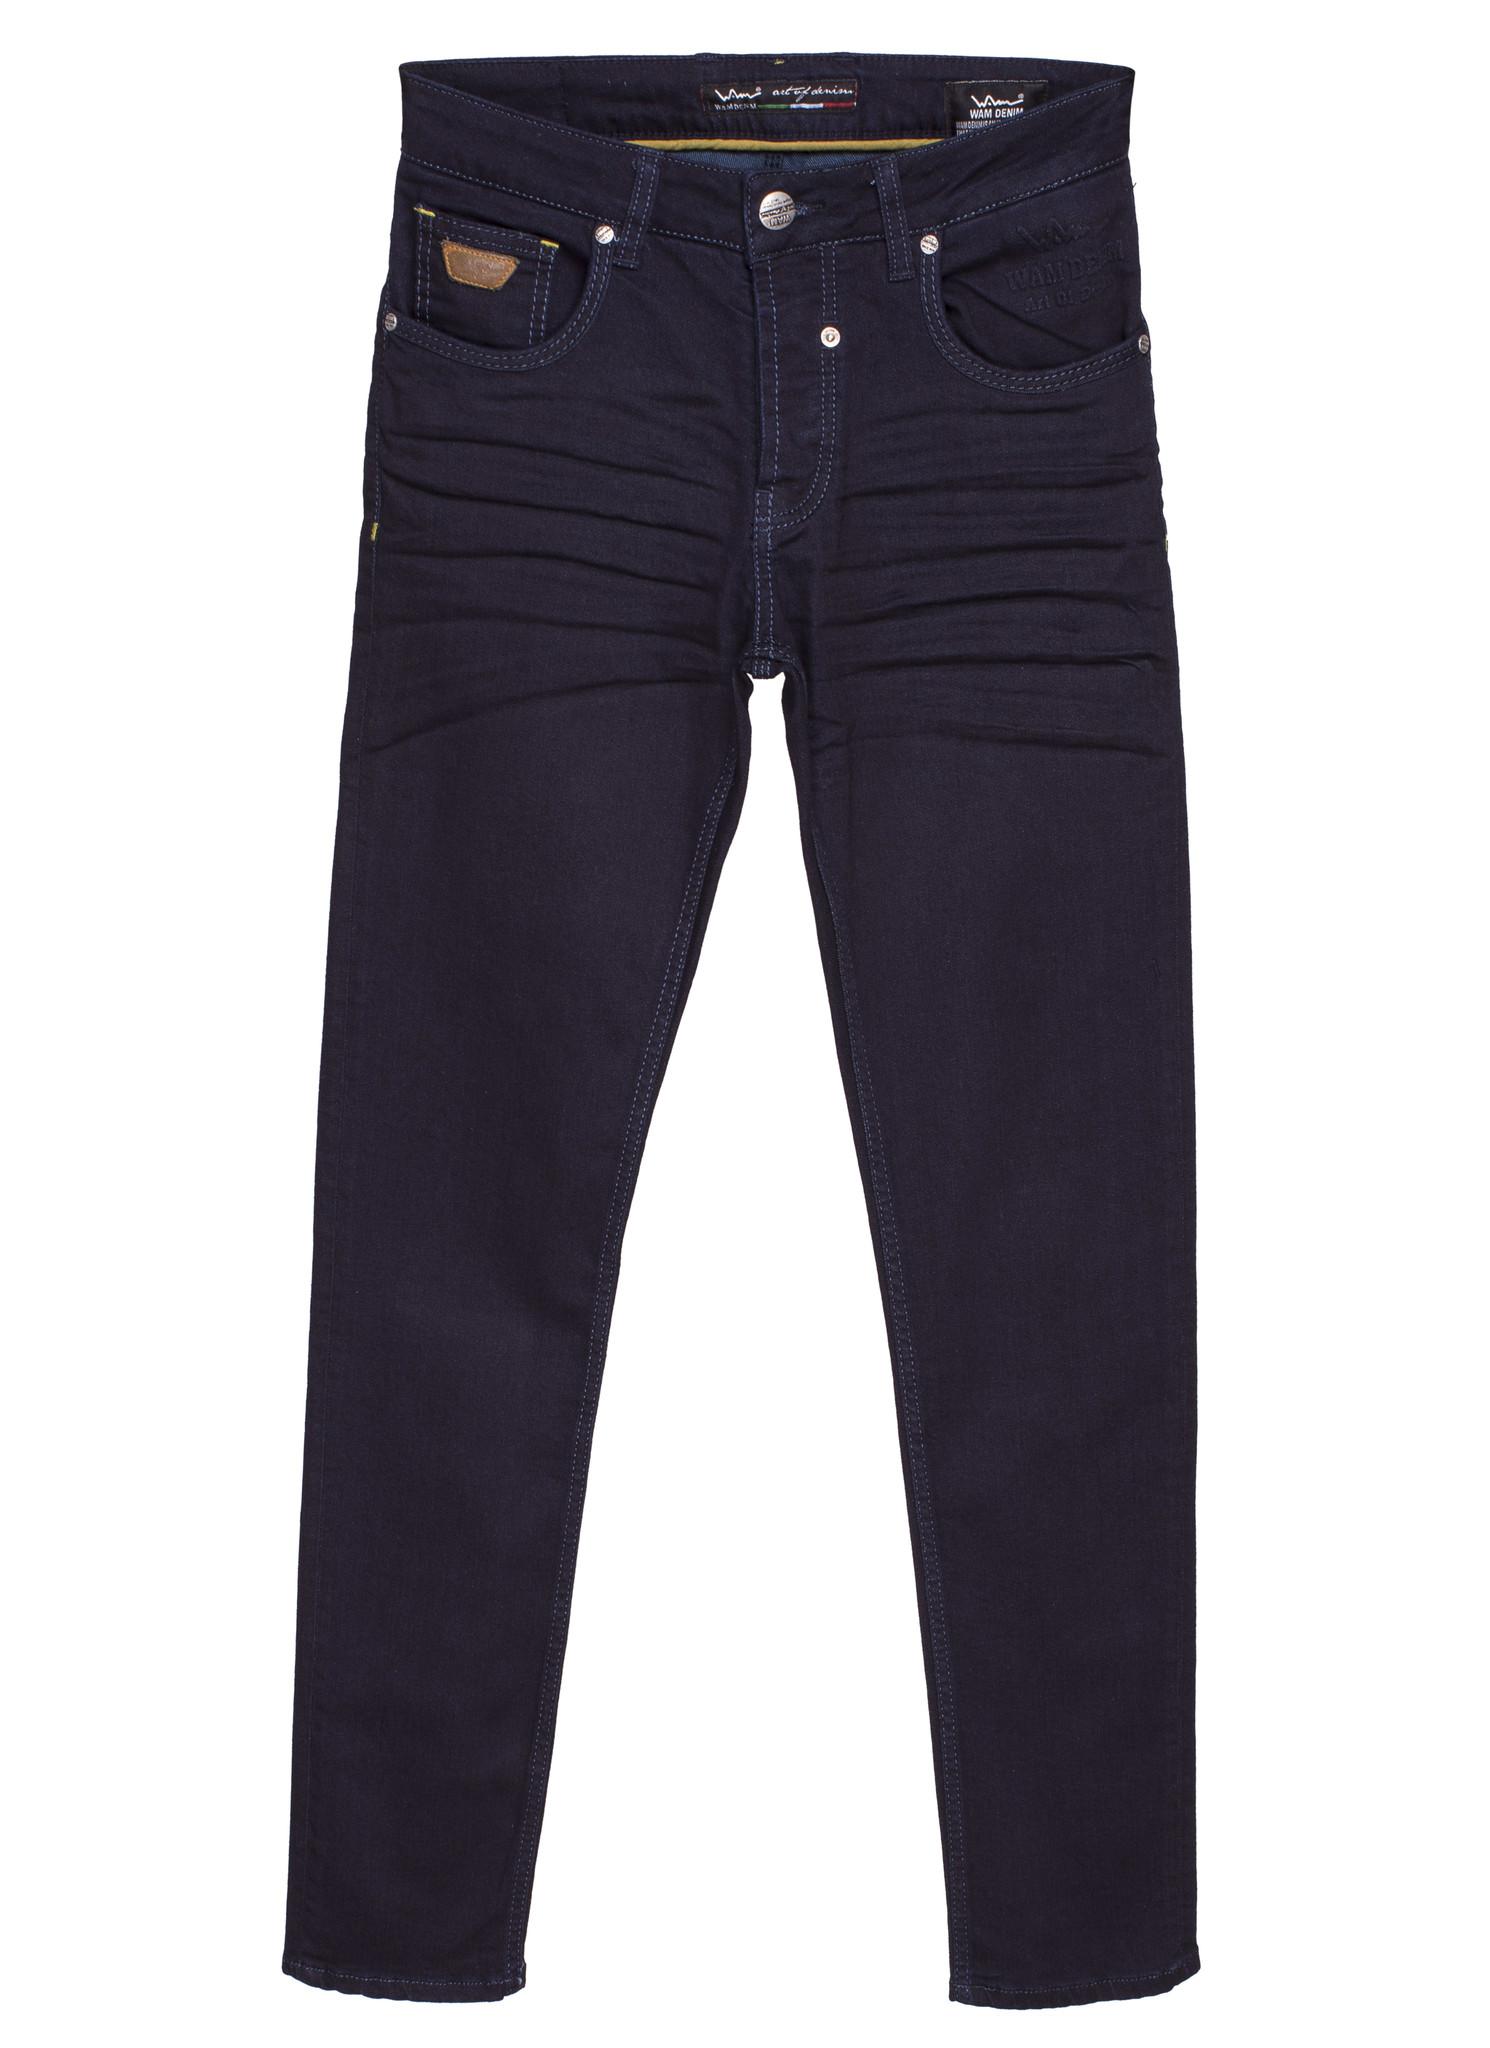 Wam Denim Jeans 72030  Dark Navy